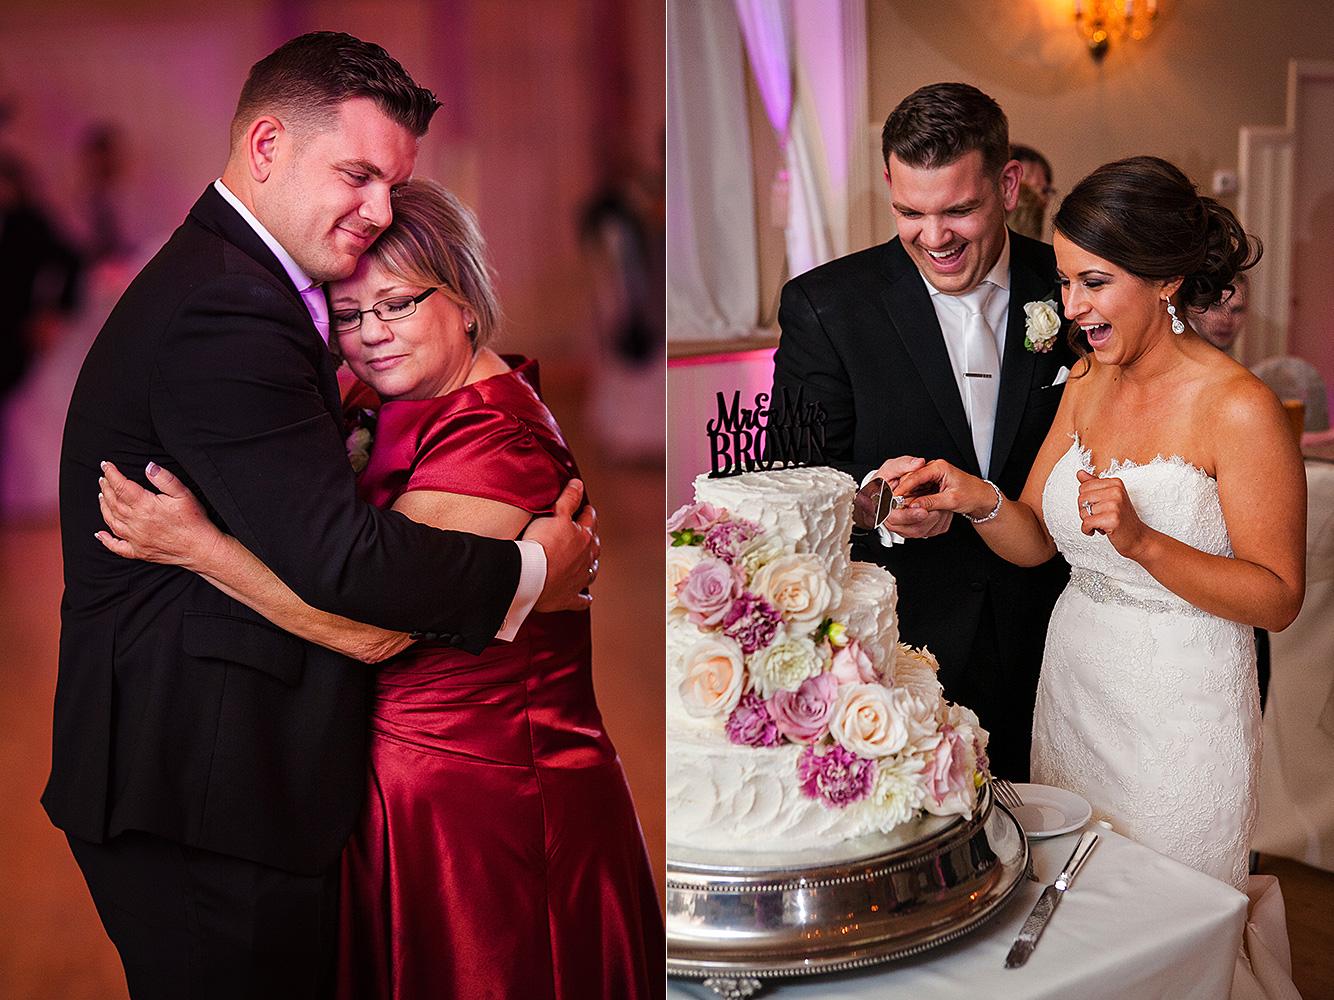 NY_Wedding_Photographer_AsEr_44.jpg